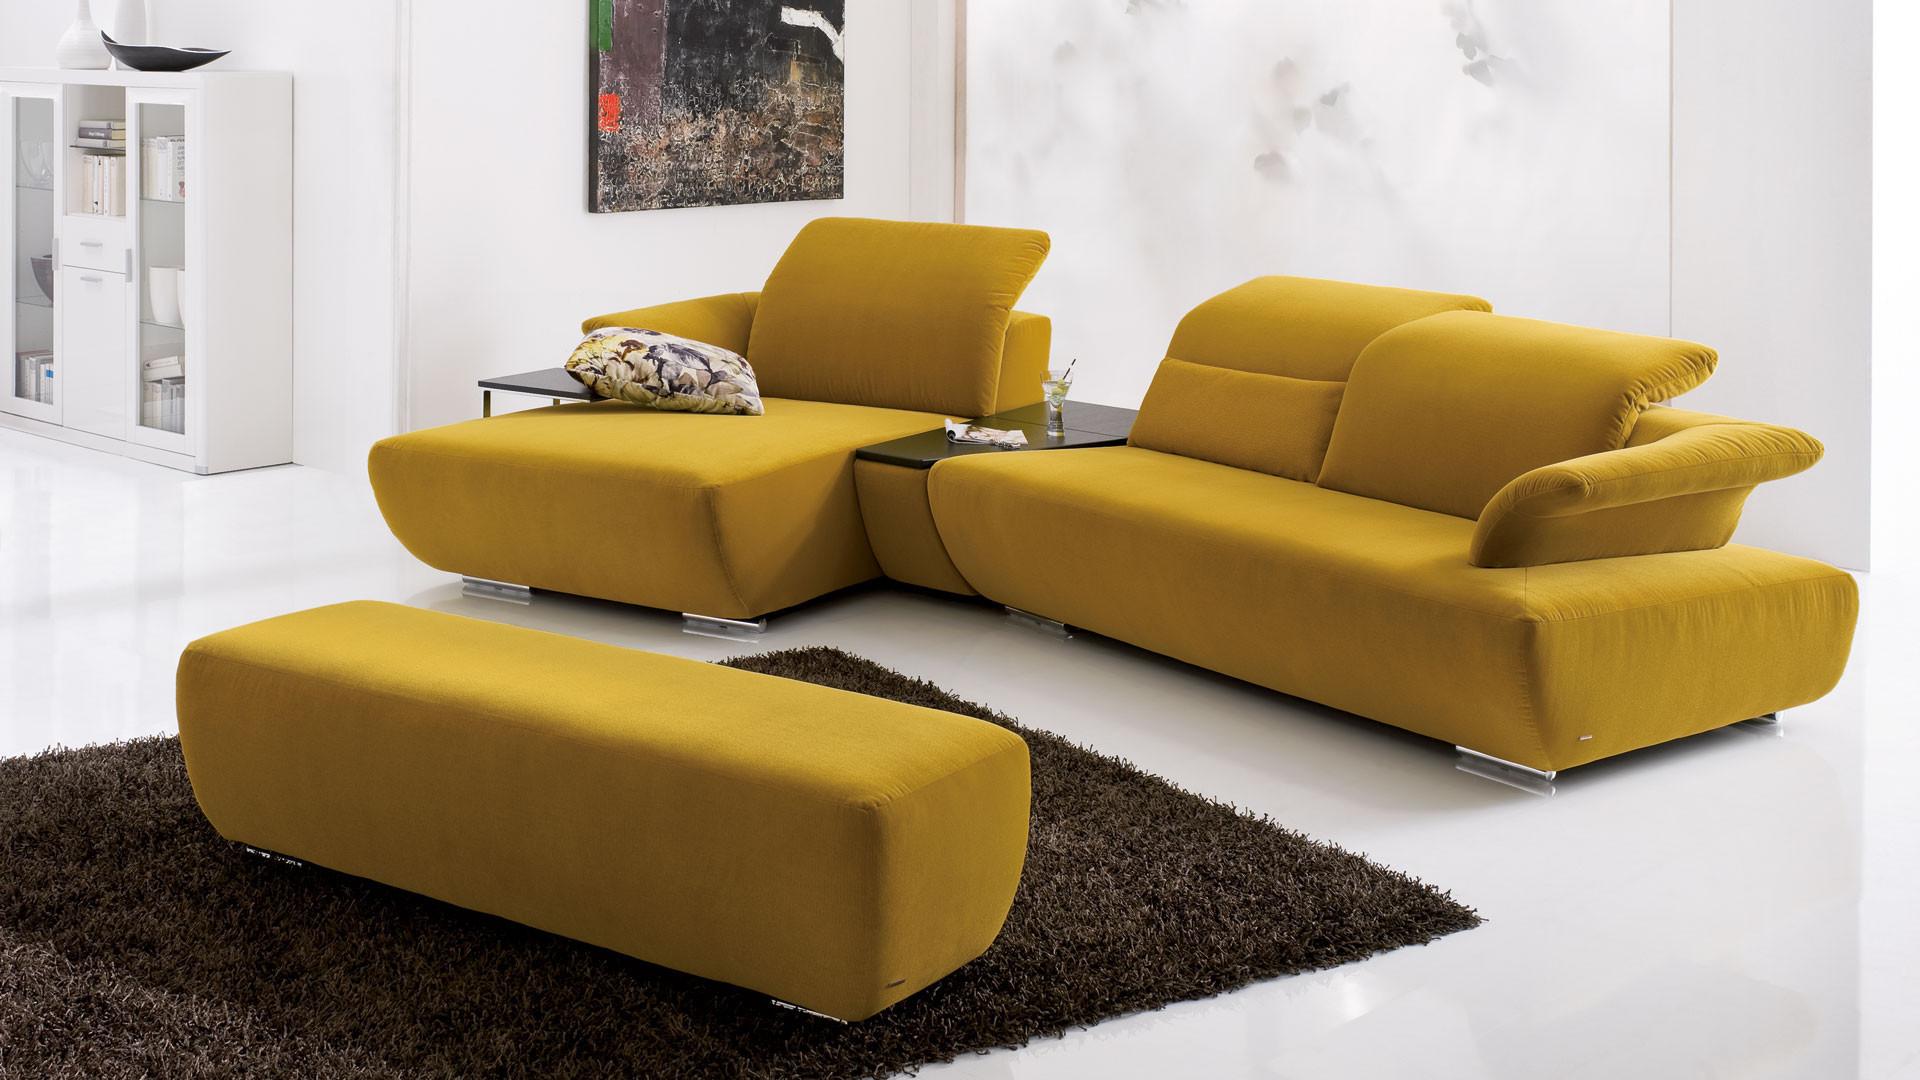 Koinor Sofa  Koinor Avanti Sofa